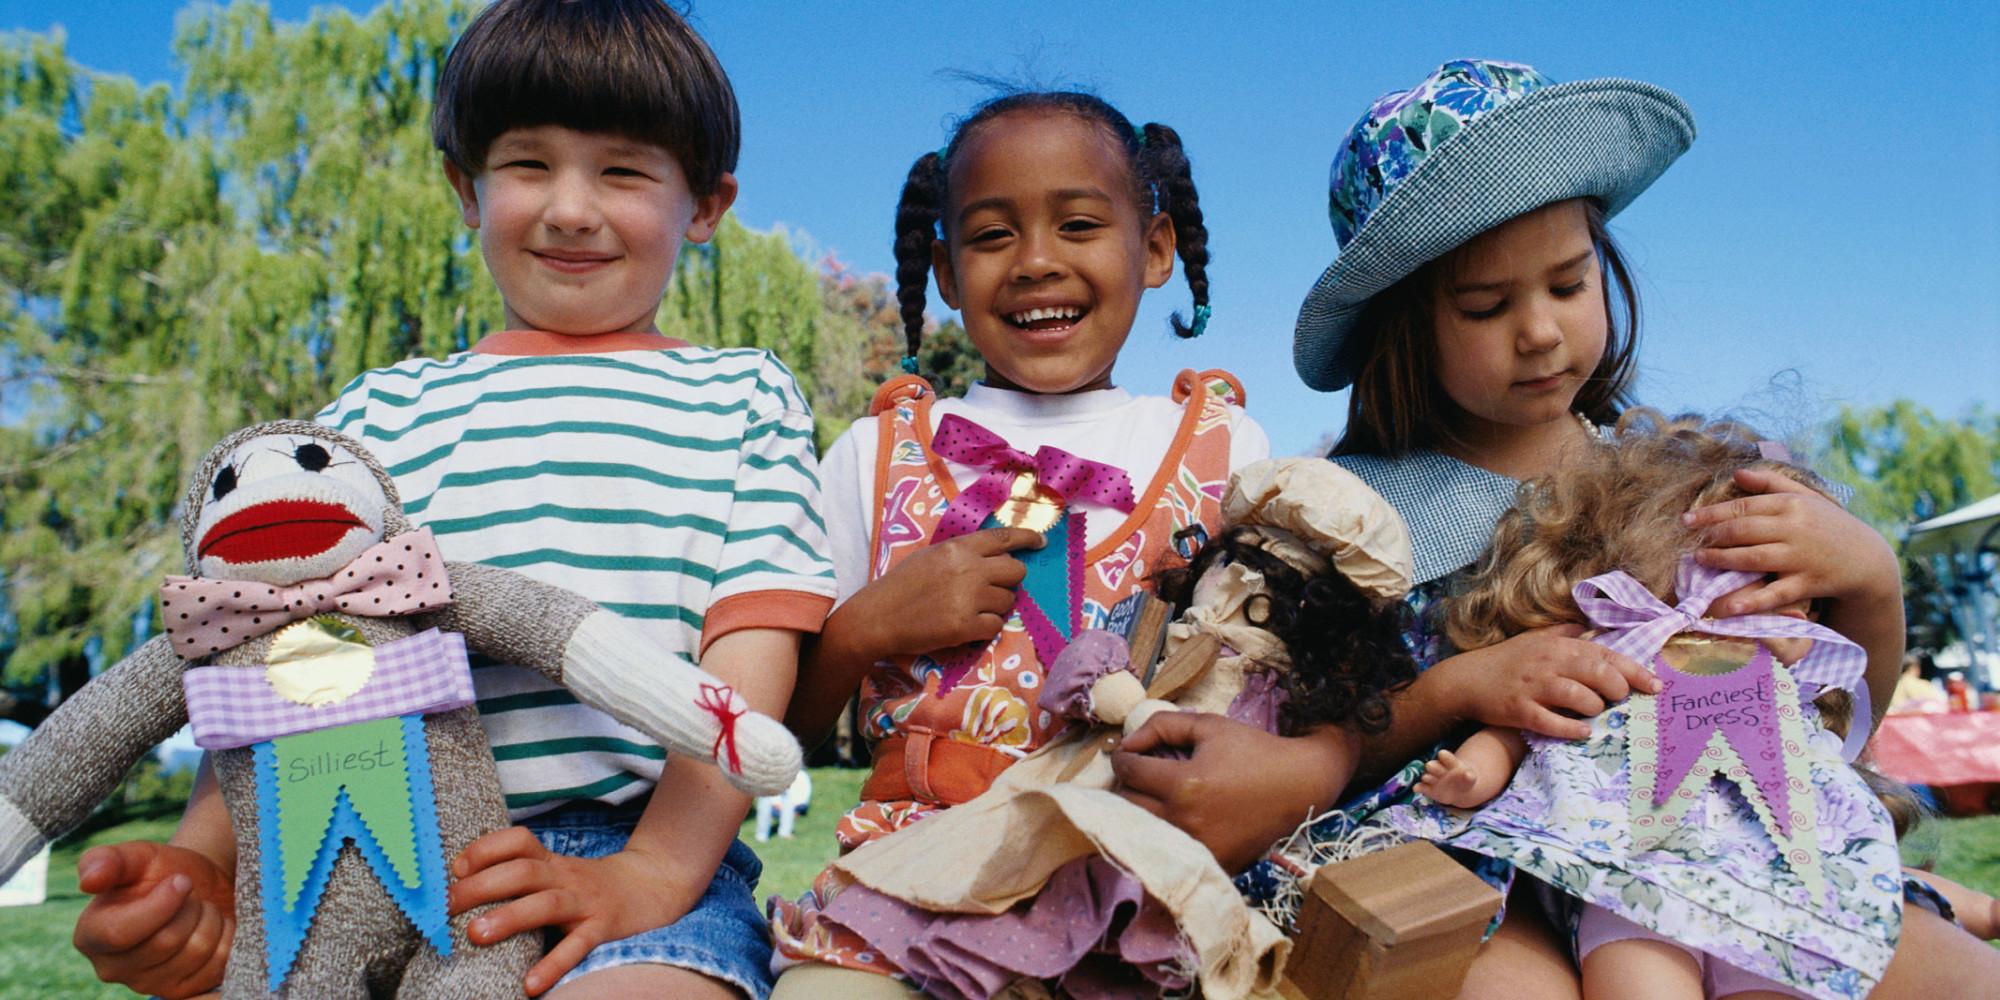 Black Dolls White Dolls And The Desegregation Of America